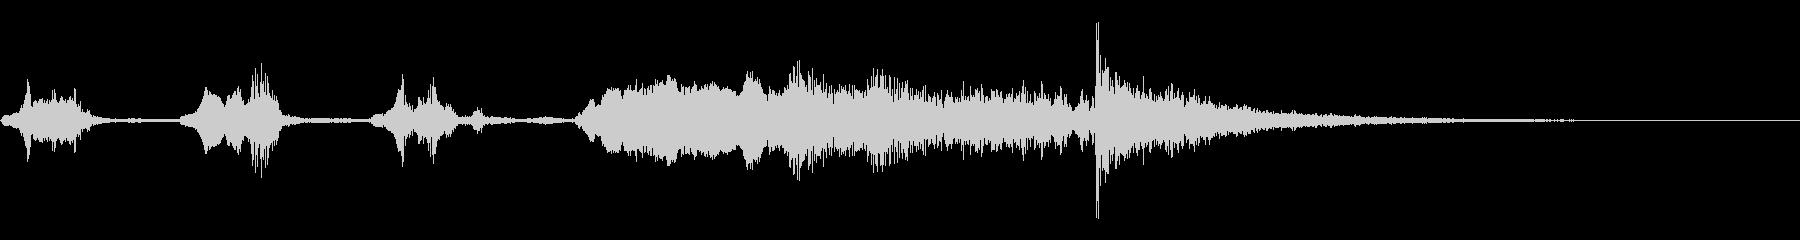 PIANO GLISSを使用したス...の未再生の波形